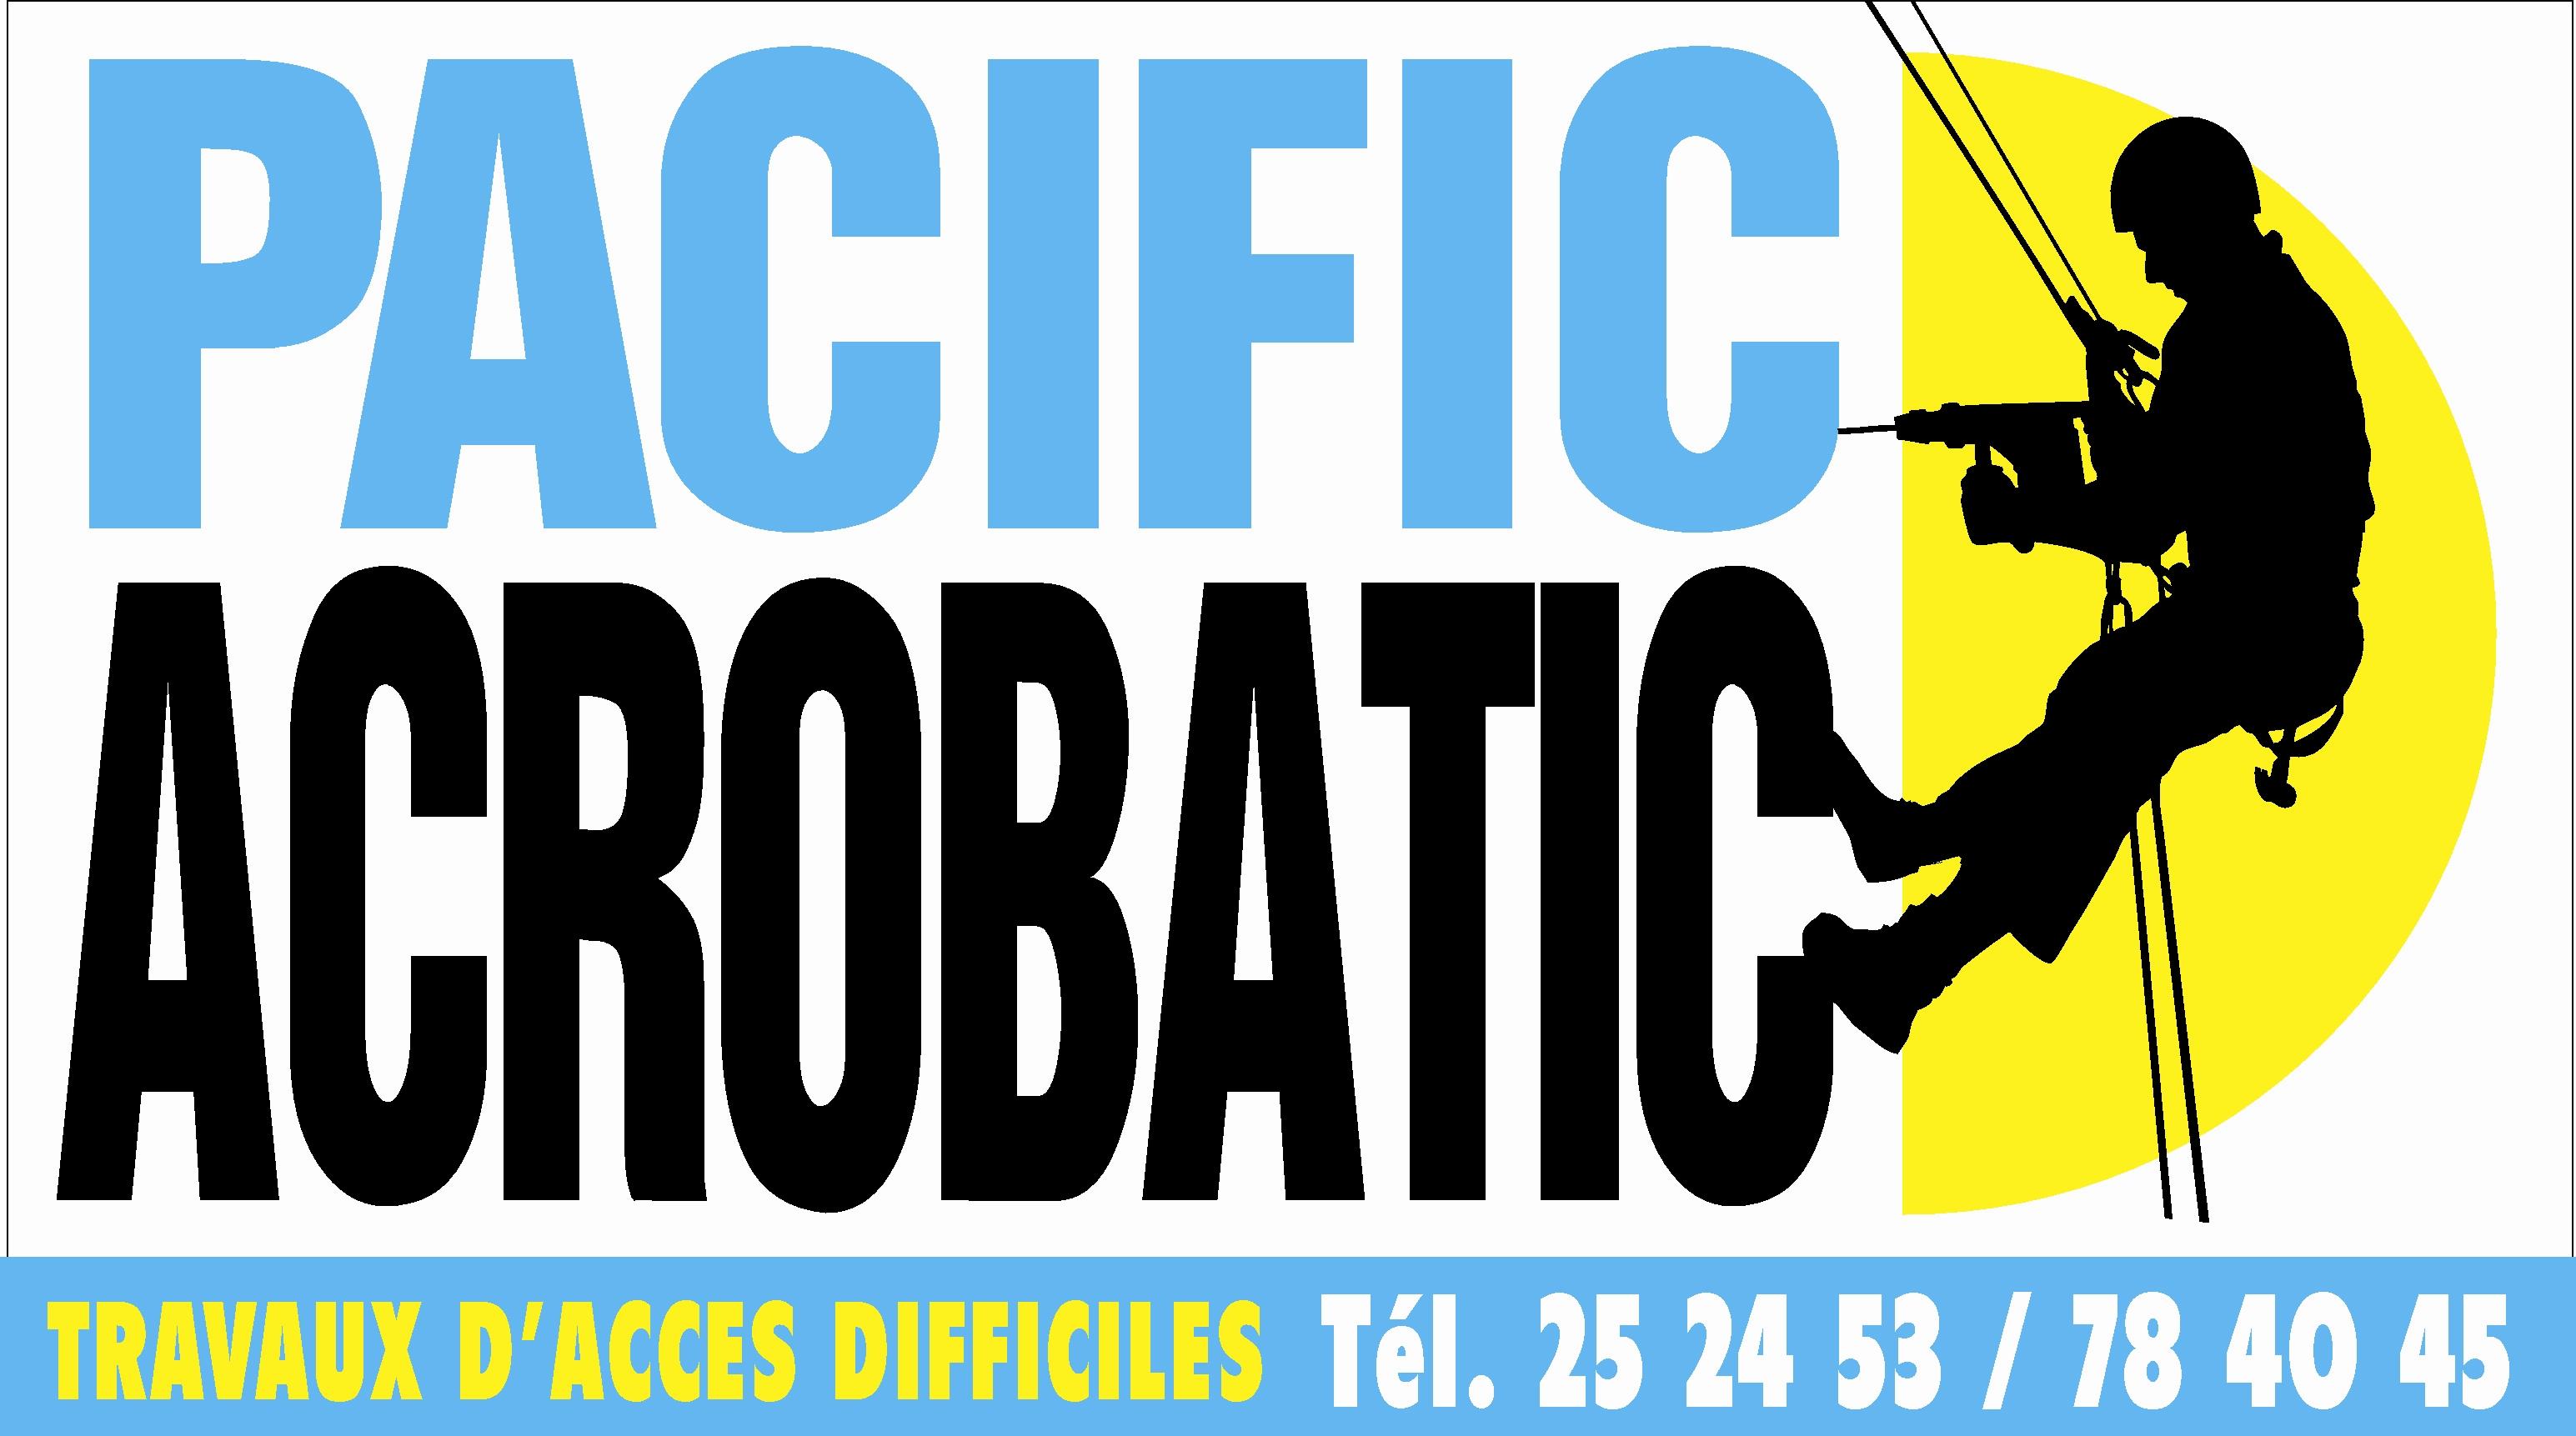 PACIFIC ACROBATIC